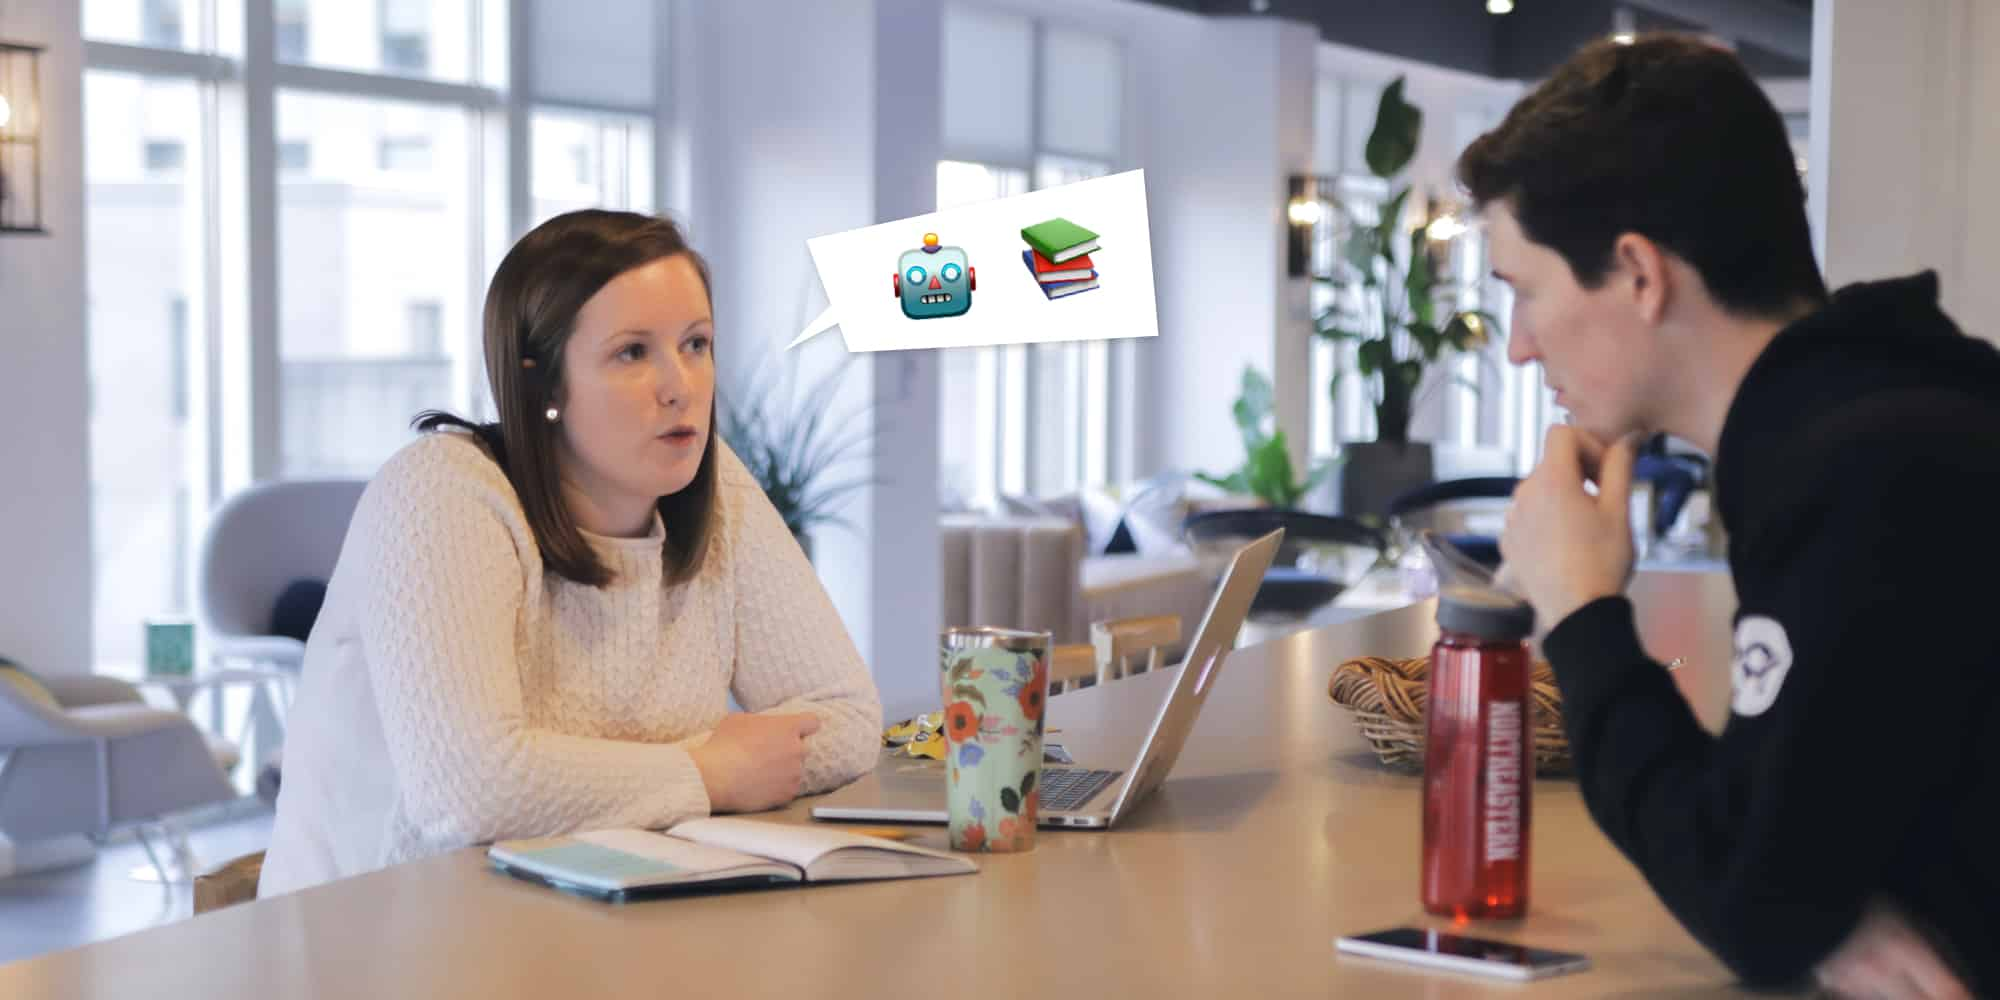 How to adapt marketing strategies amid COVID